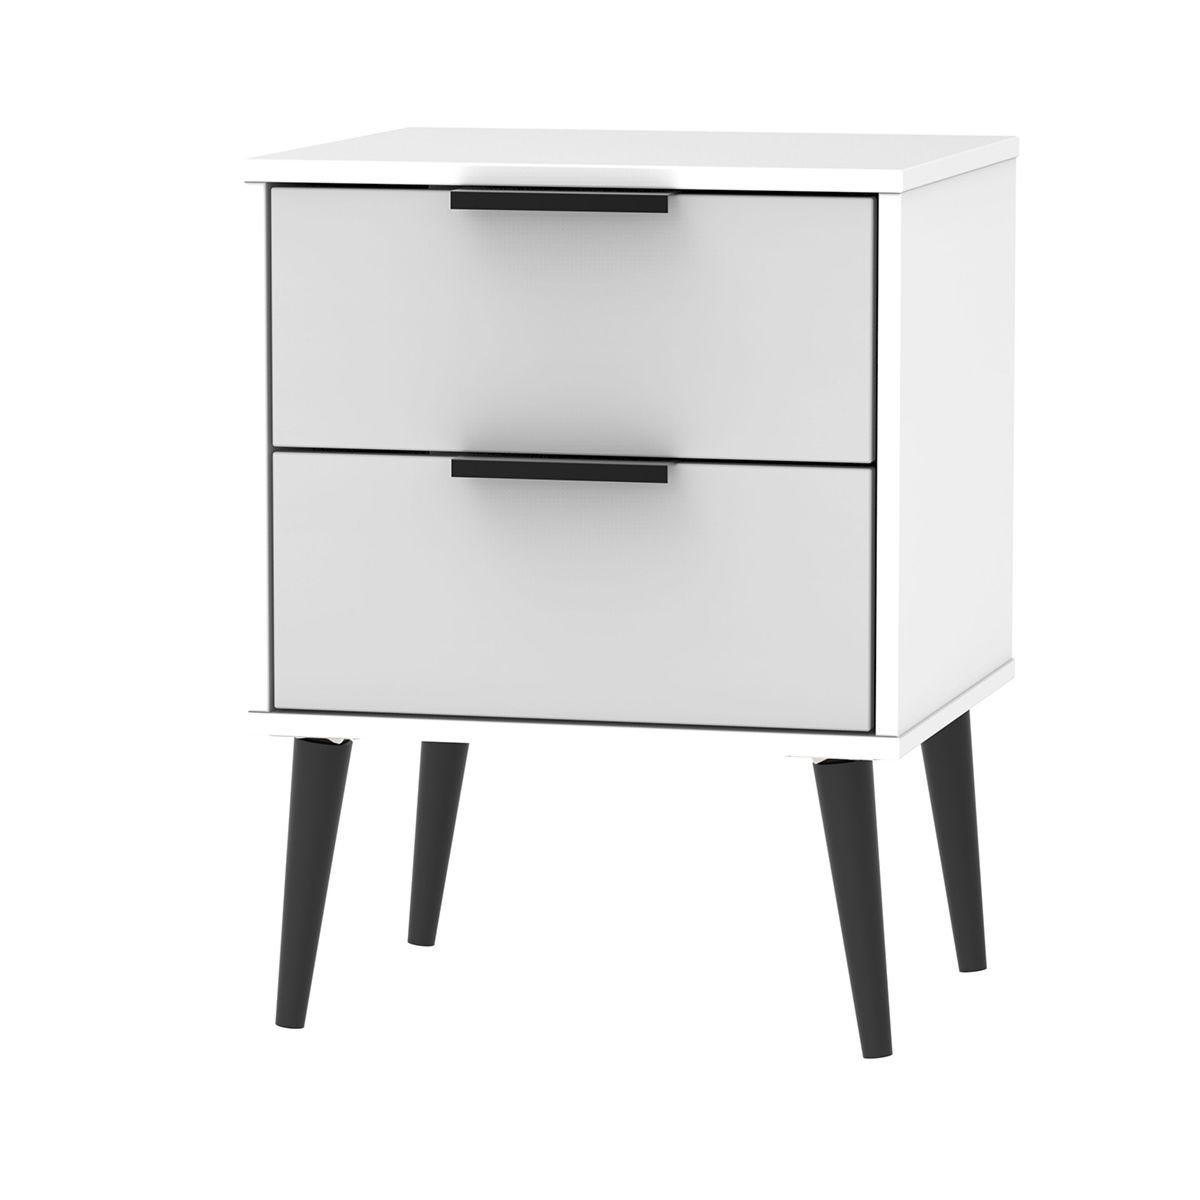 Hirato 2 Drawer Grey/White Locker With Black Wooden Legs